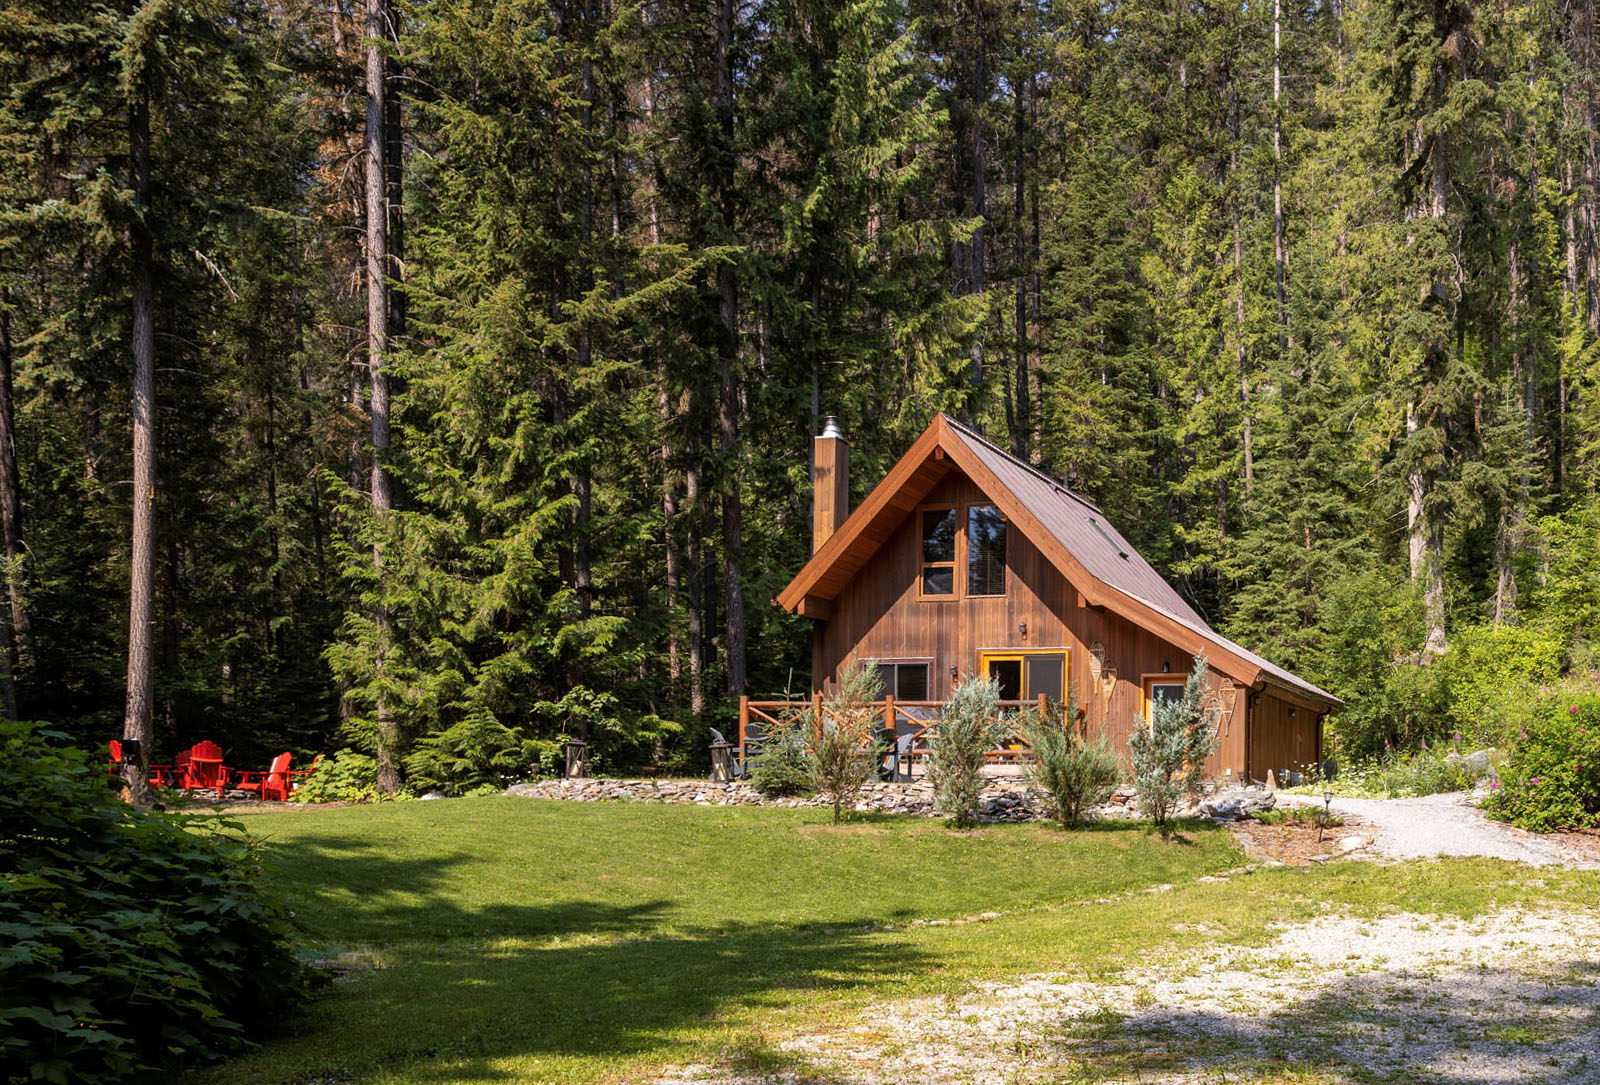 Mount robson log home 02